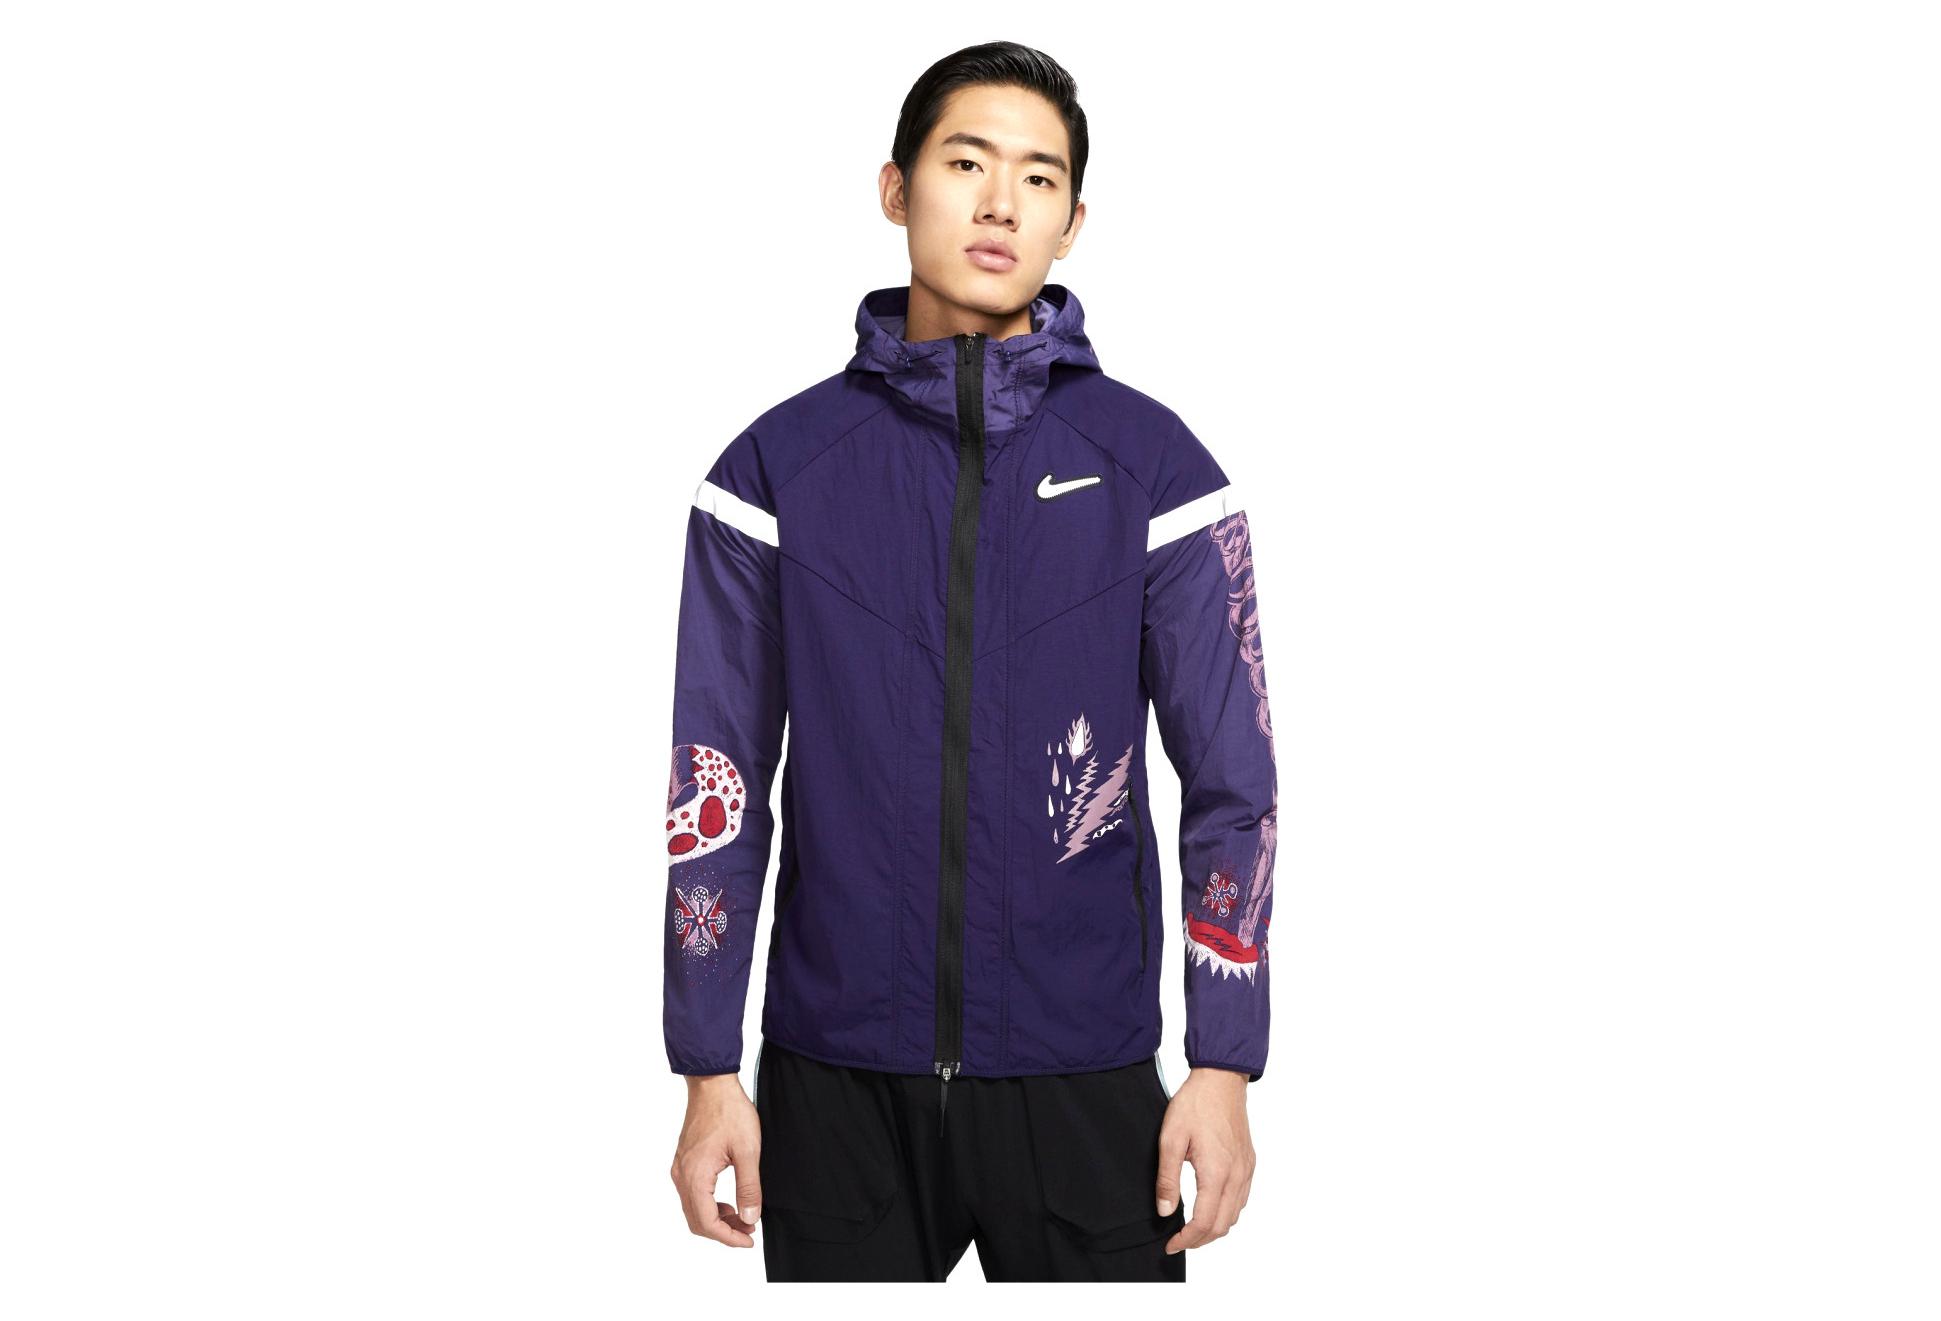 Windproof Jacket Nike Windrunner Wild Run Blue Pink Men